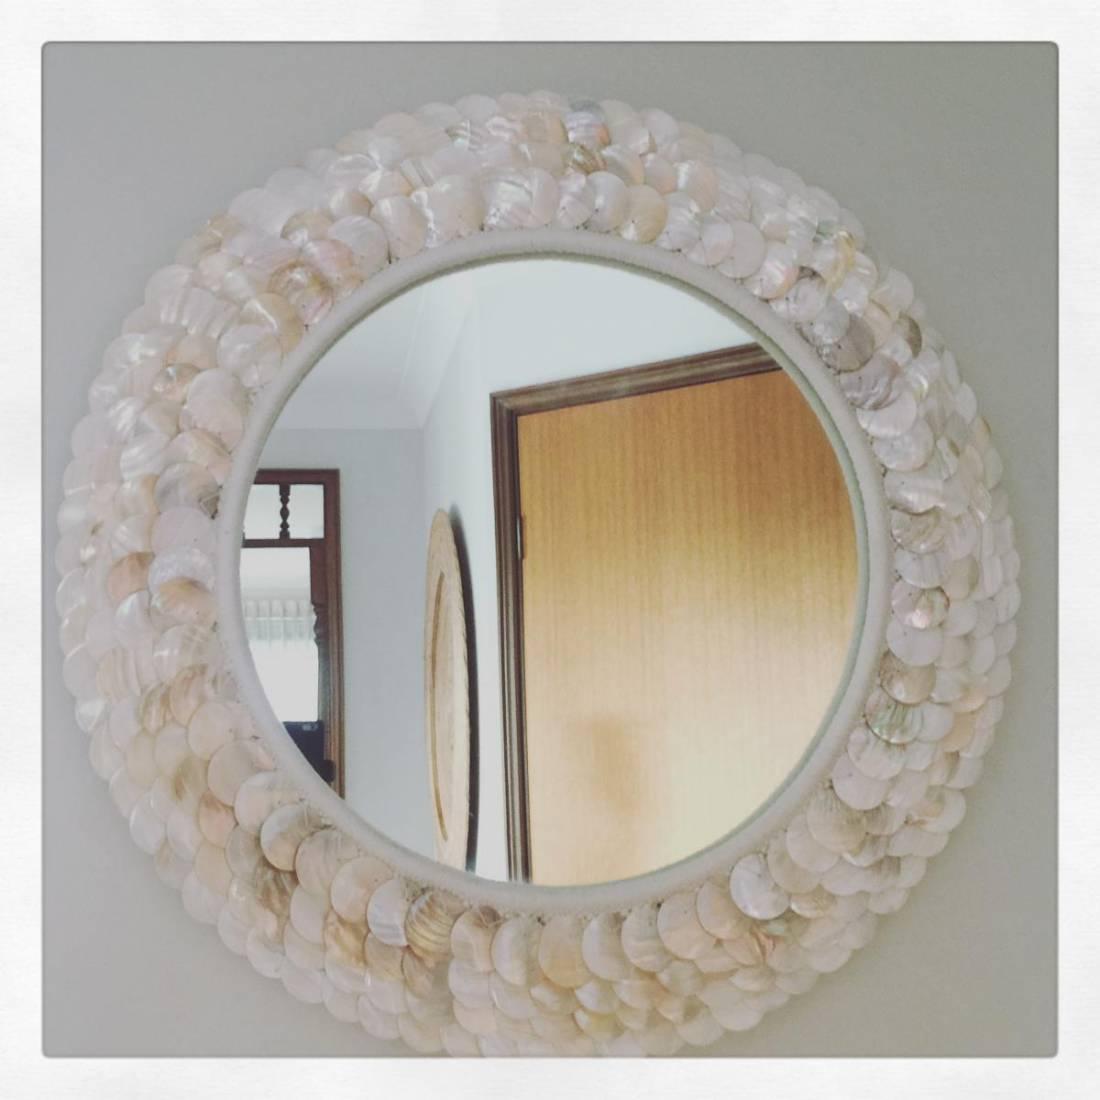 Kapung Cream Shell Mirror